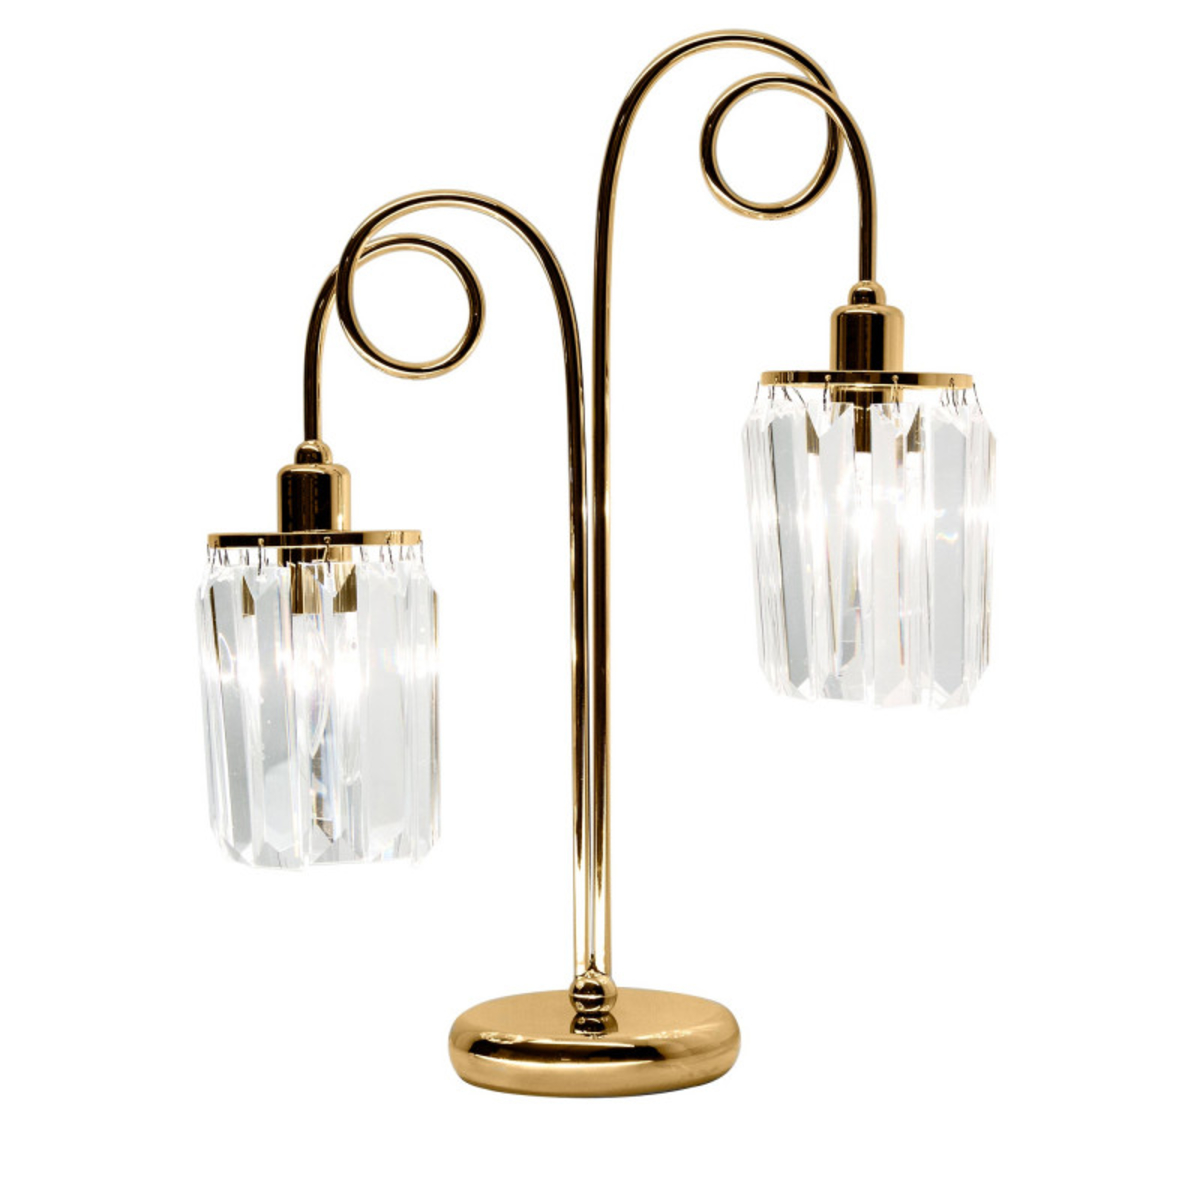 Настольная лампа Синди CL330822